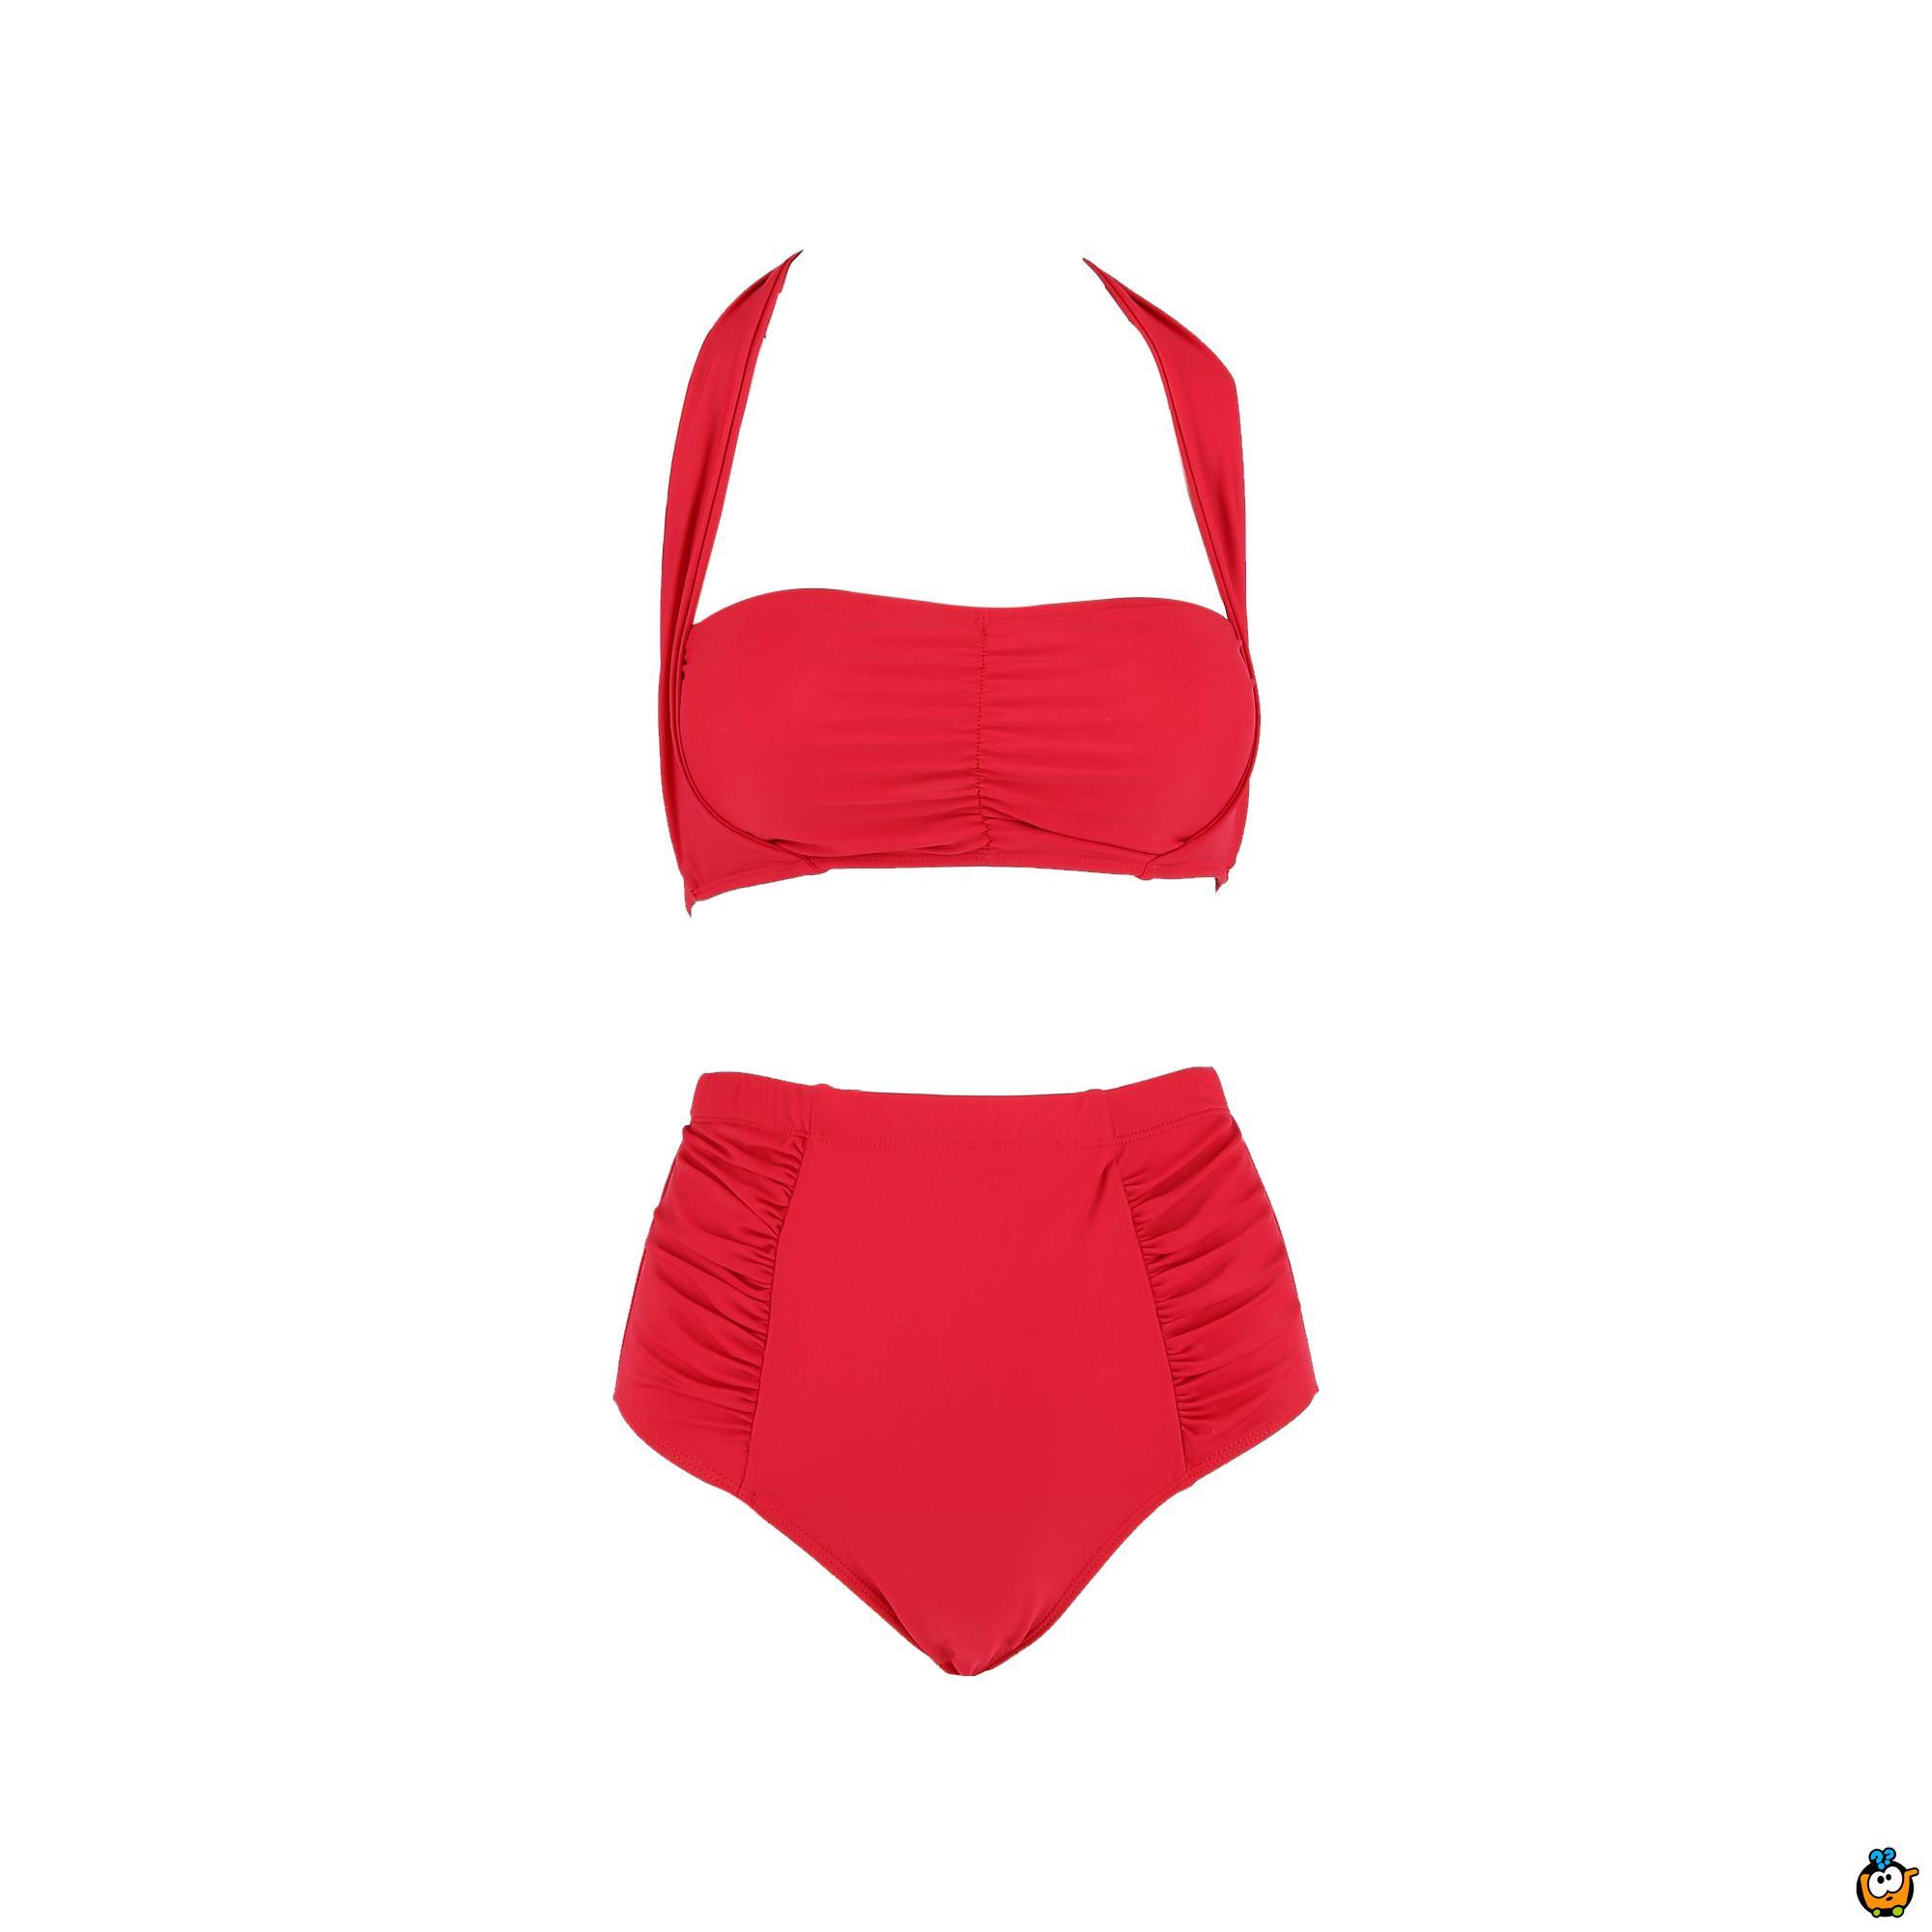 Dvodelni ženski kupaći kostim - PLUS SIZE - CLASSIC RED